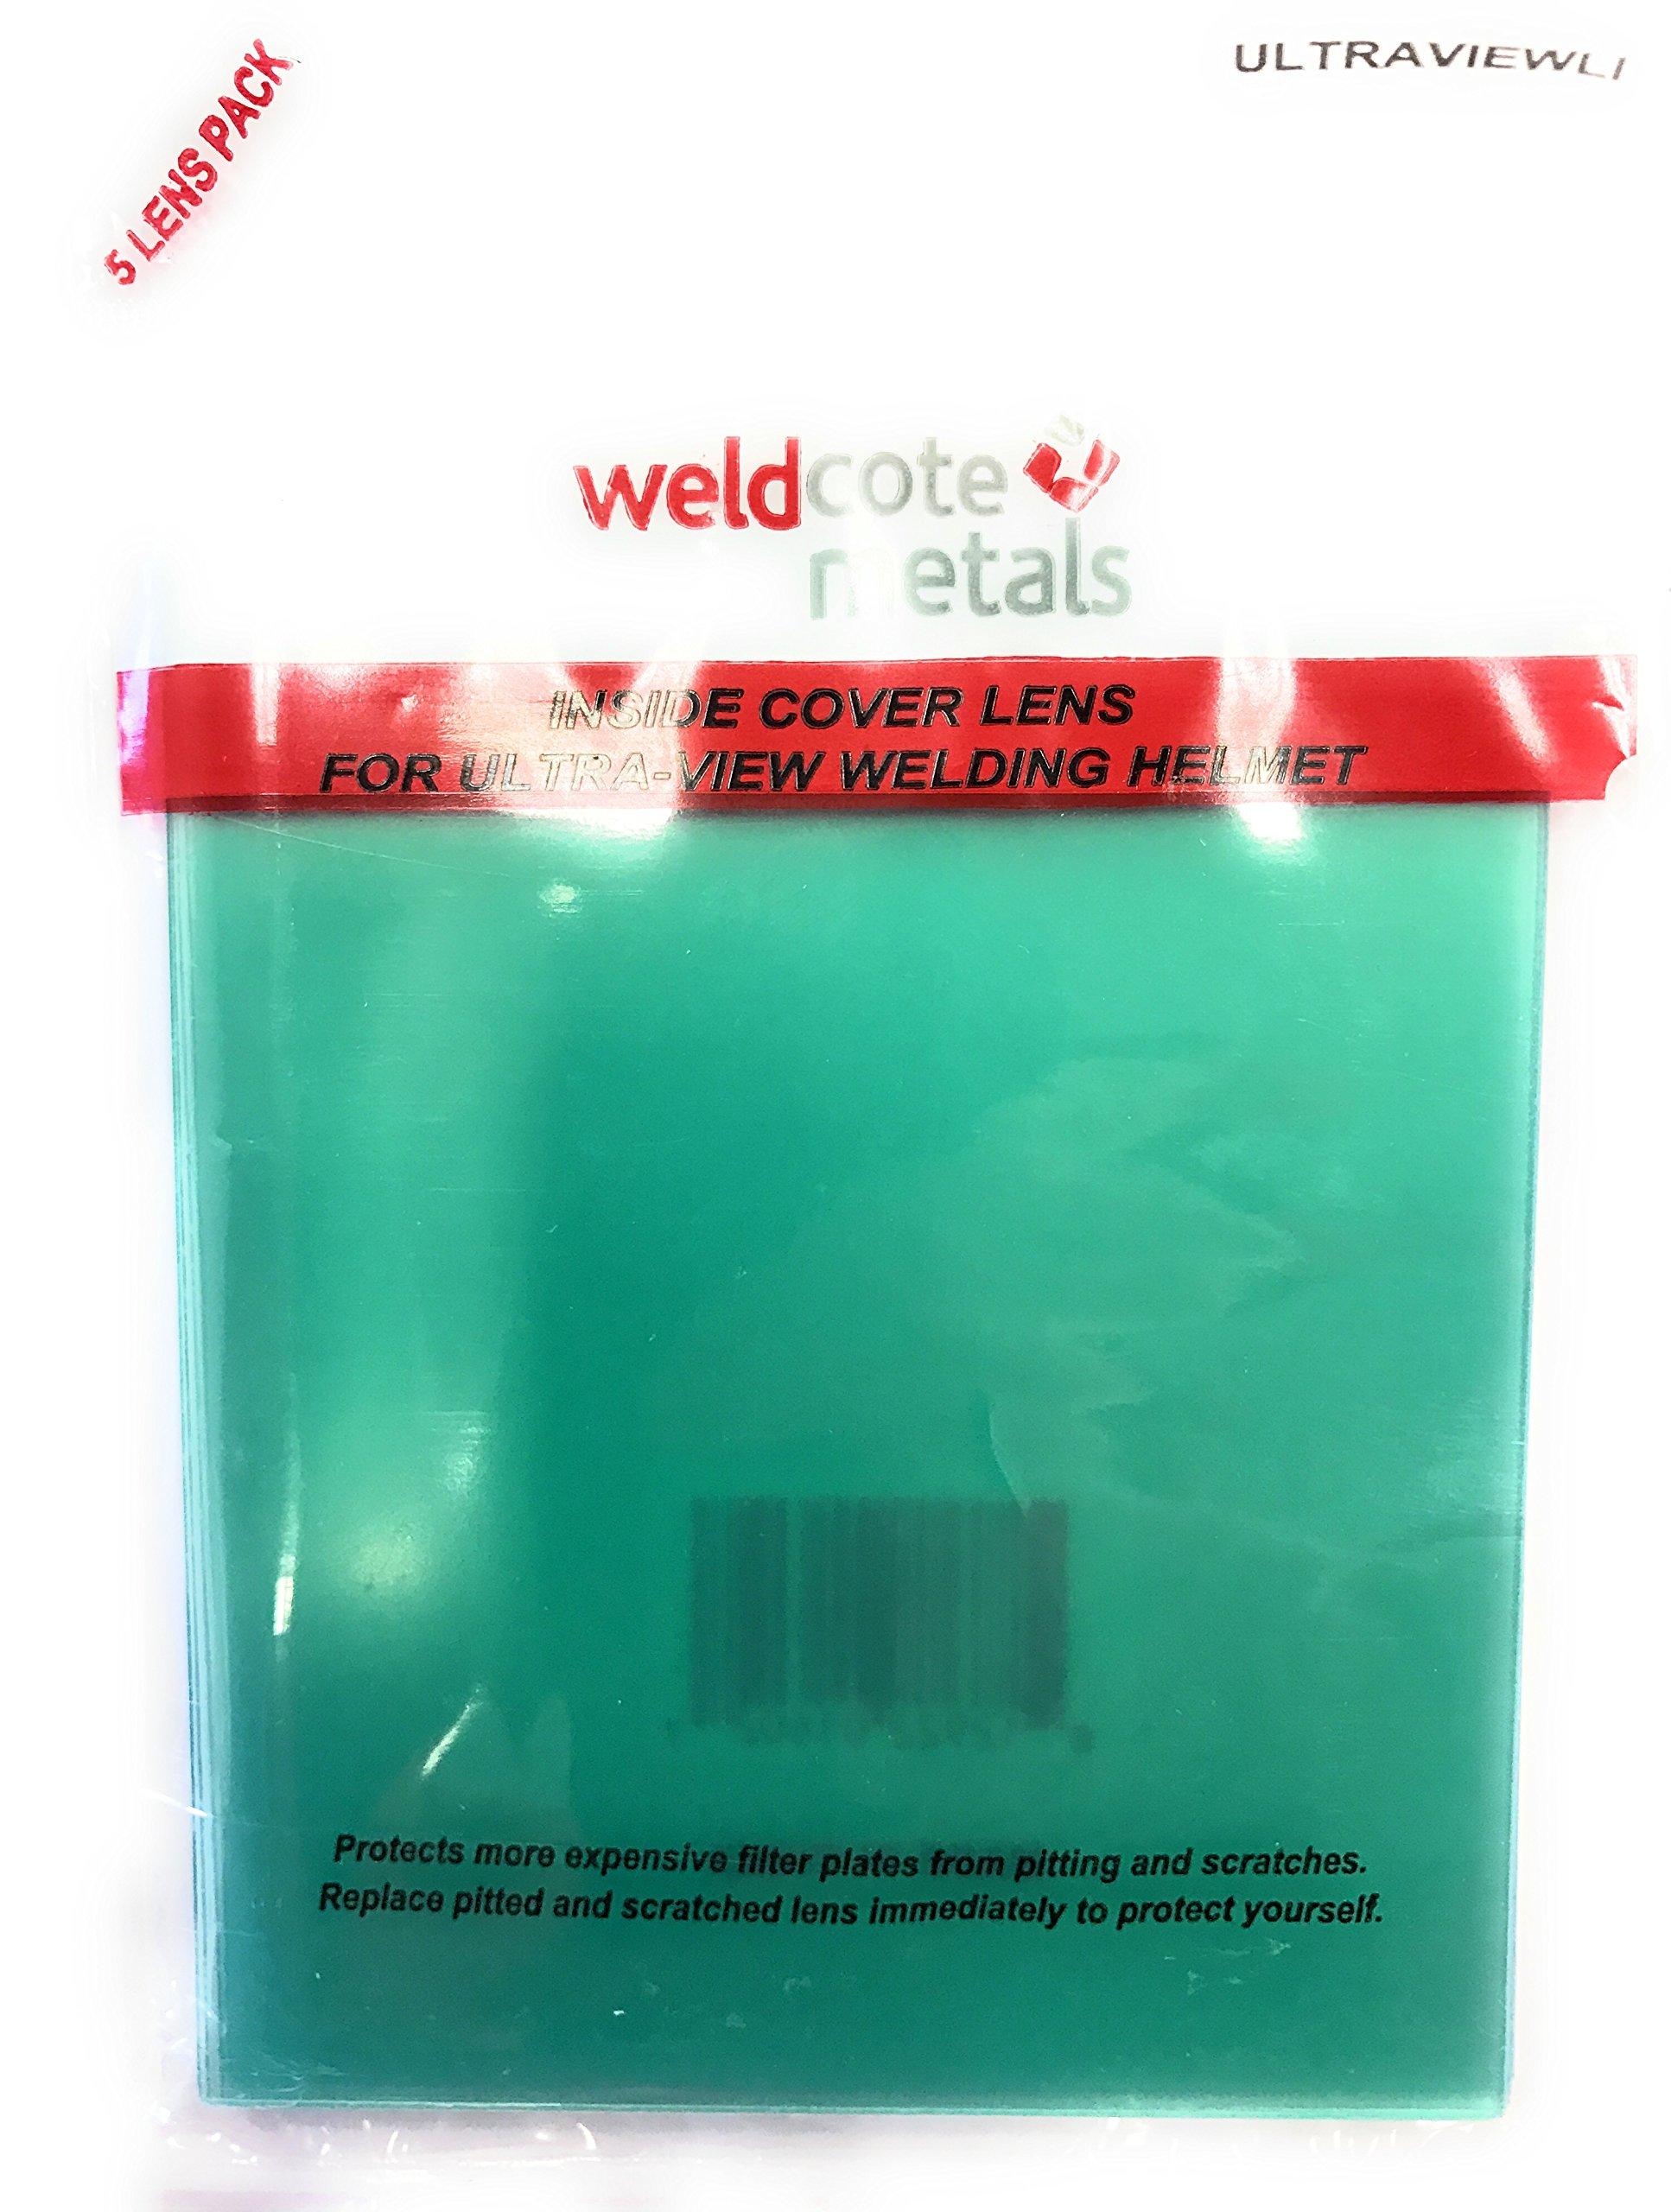 Weldcote Metals ULTRAVIEWLI Inside Cover Lens For Ultra-View Helmet Pkg=5